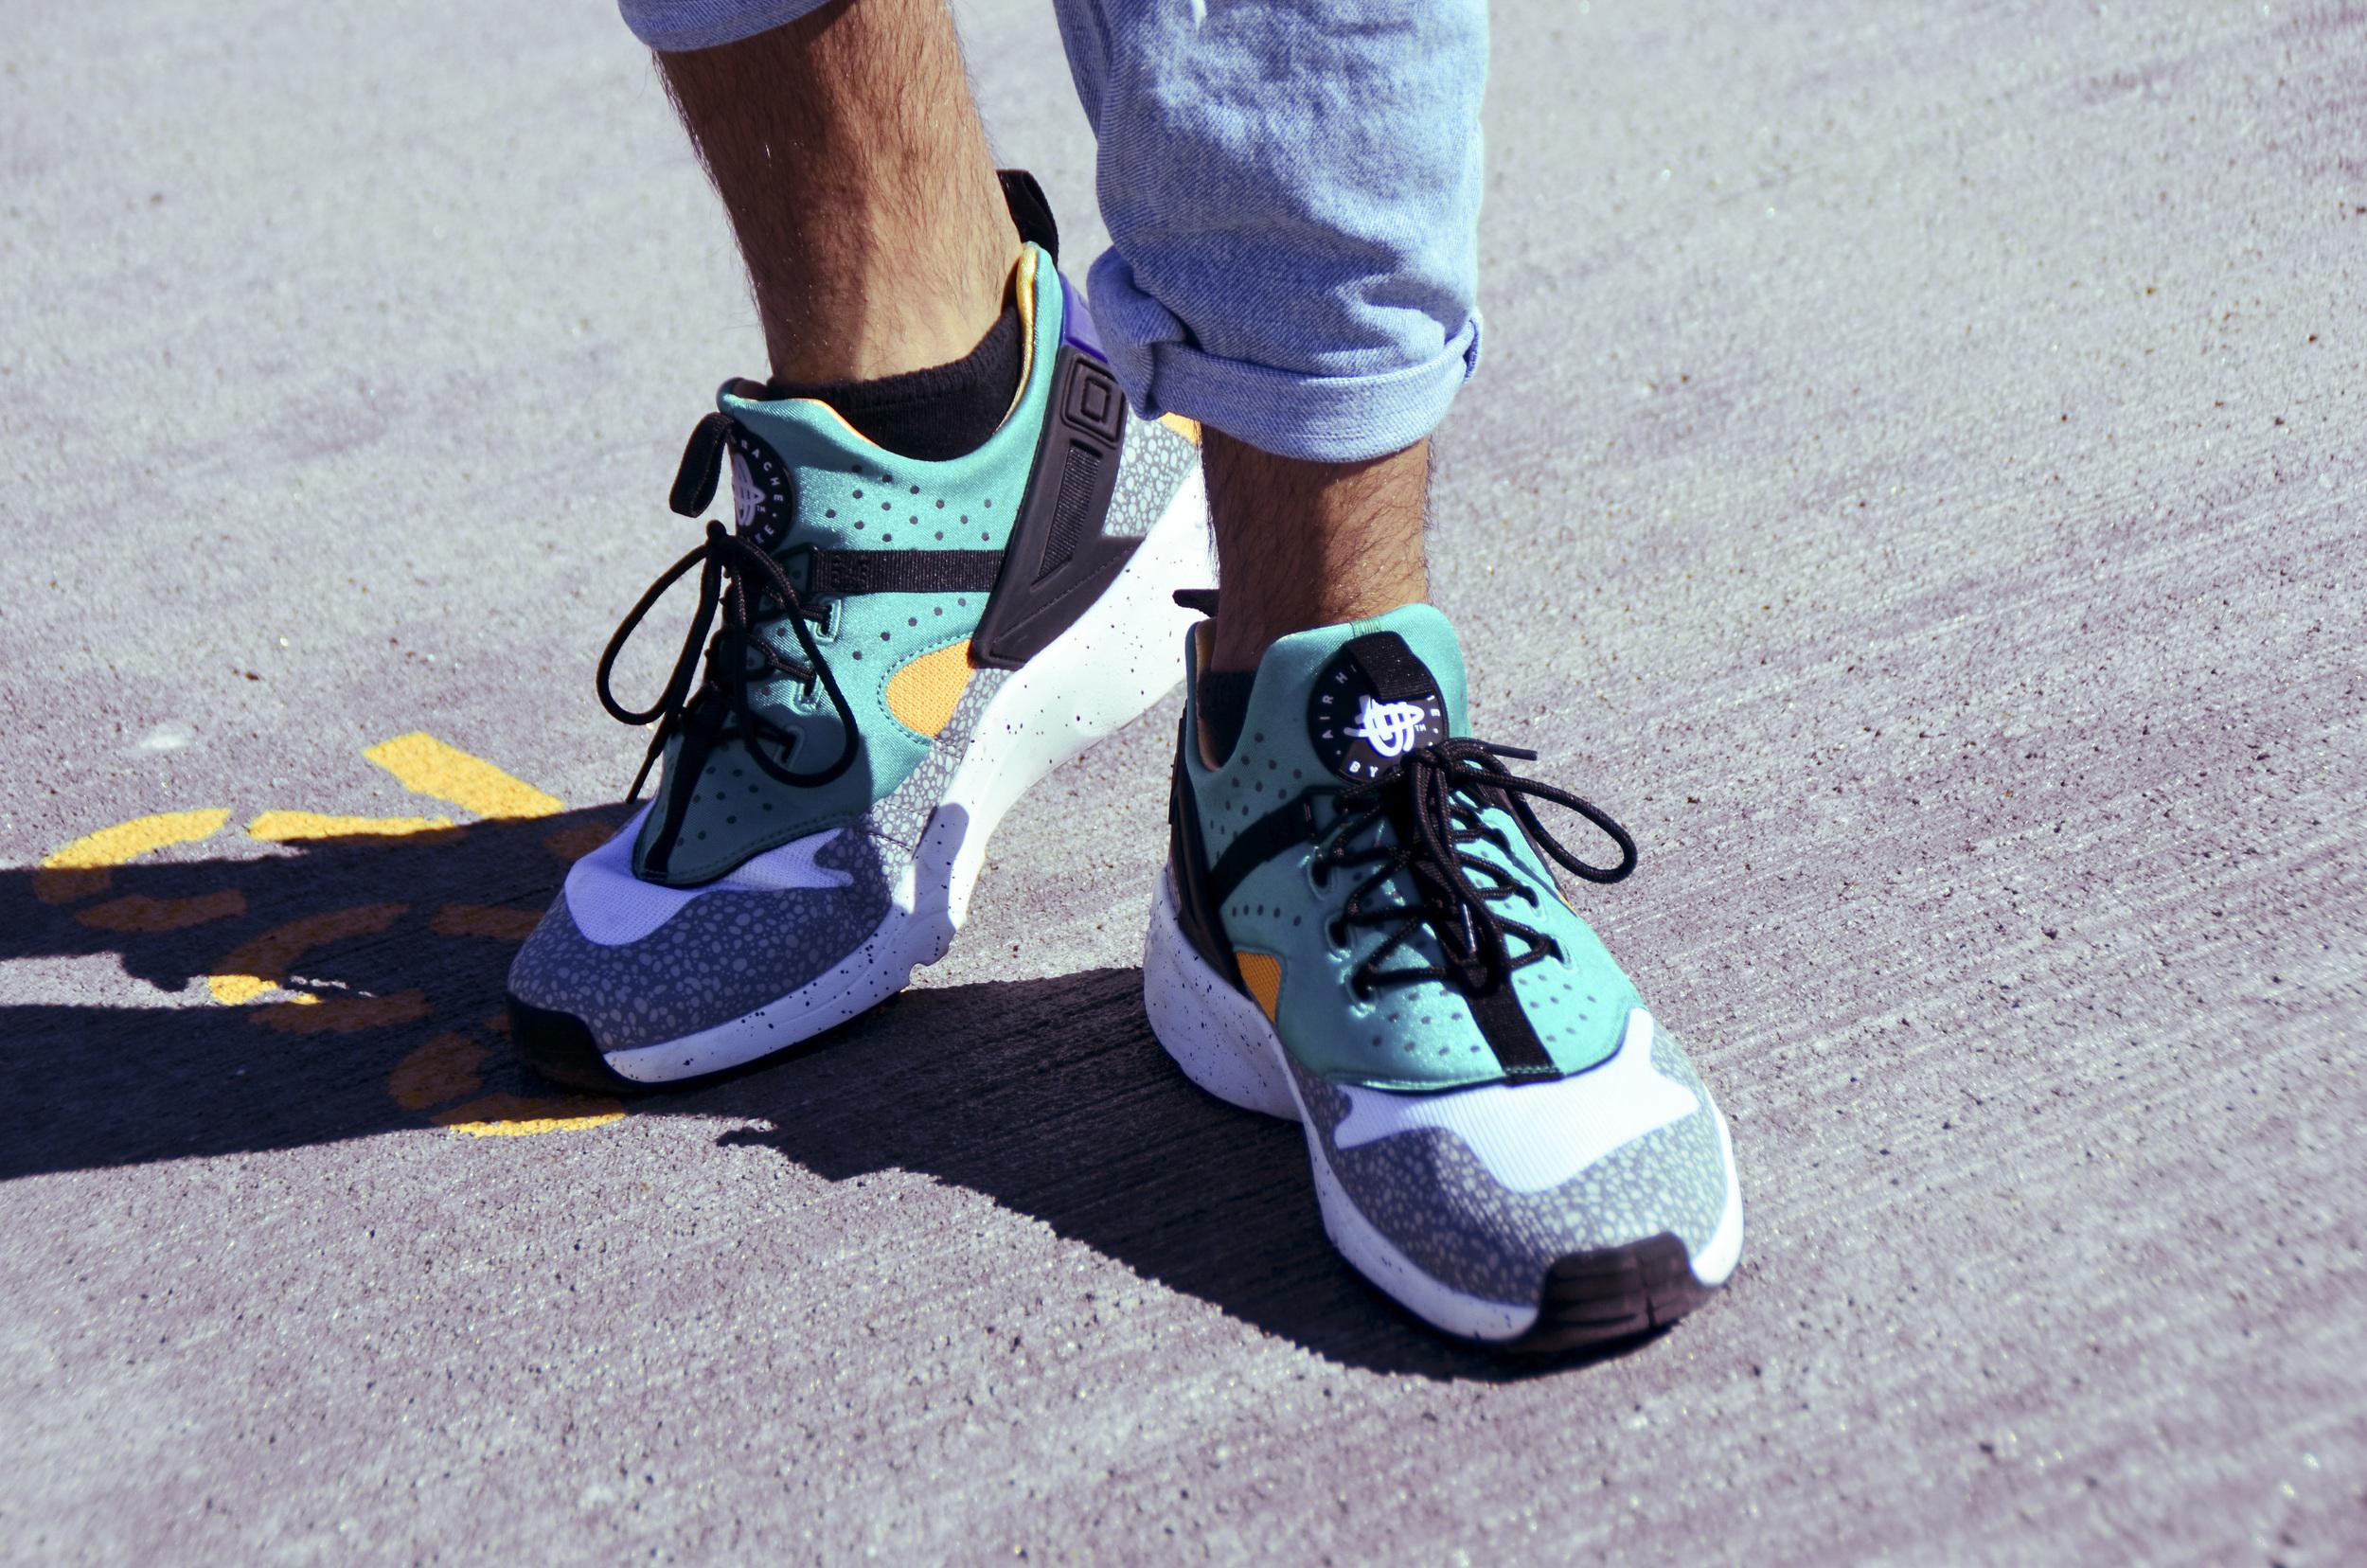 Shoes - Nike Air Huarache Utility Premiums - ( nike.com )